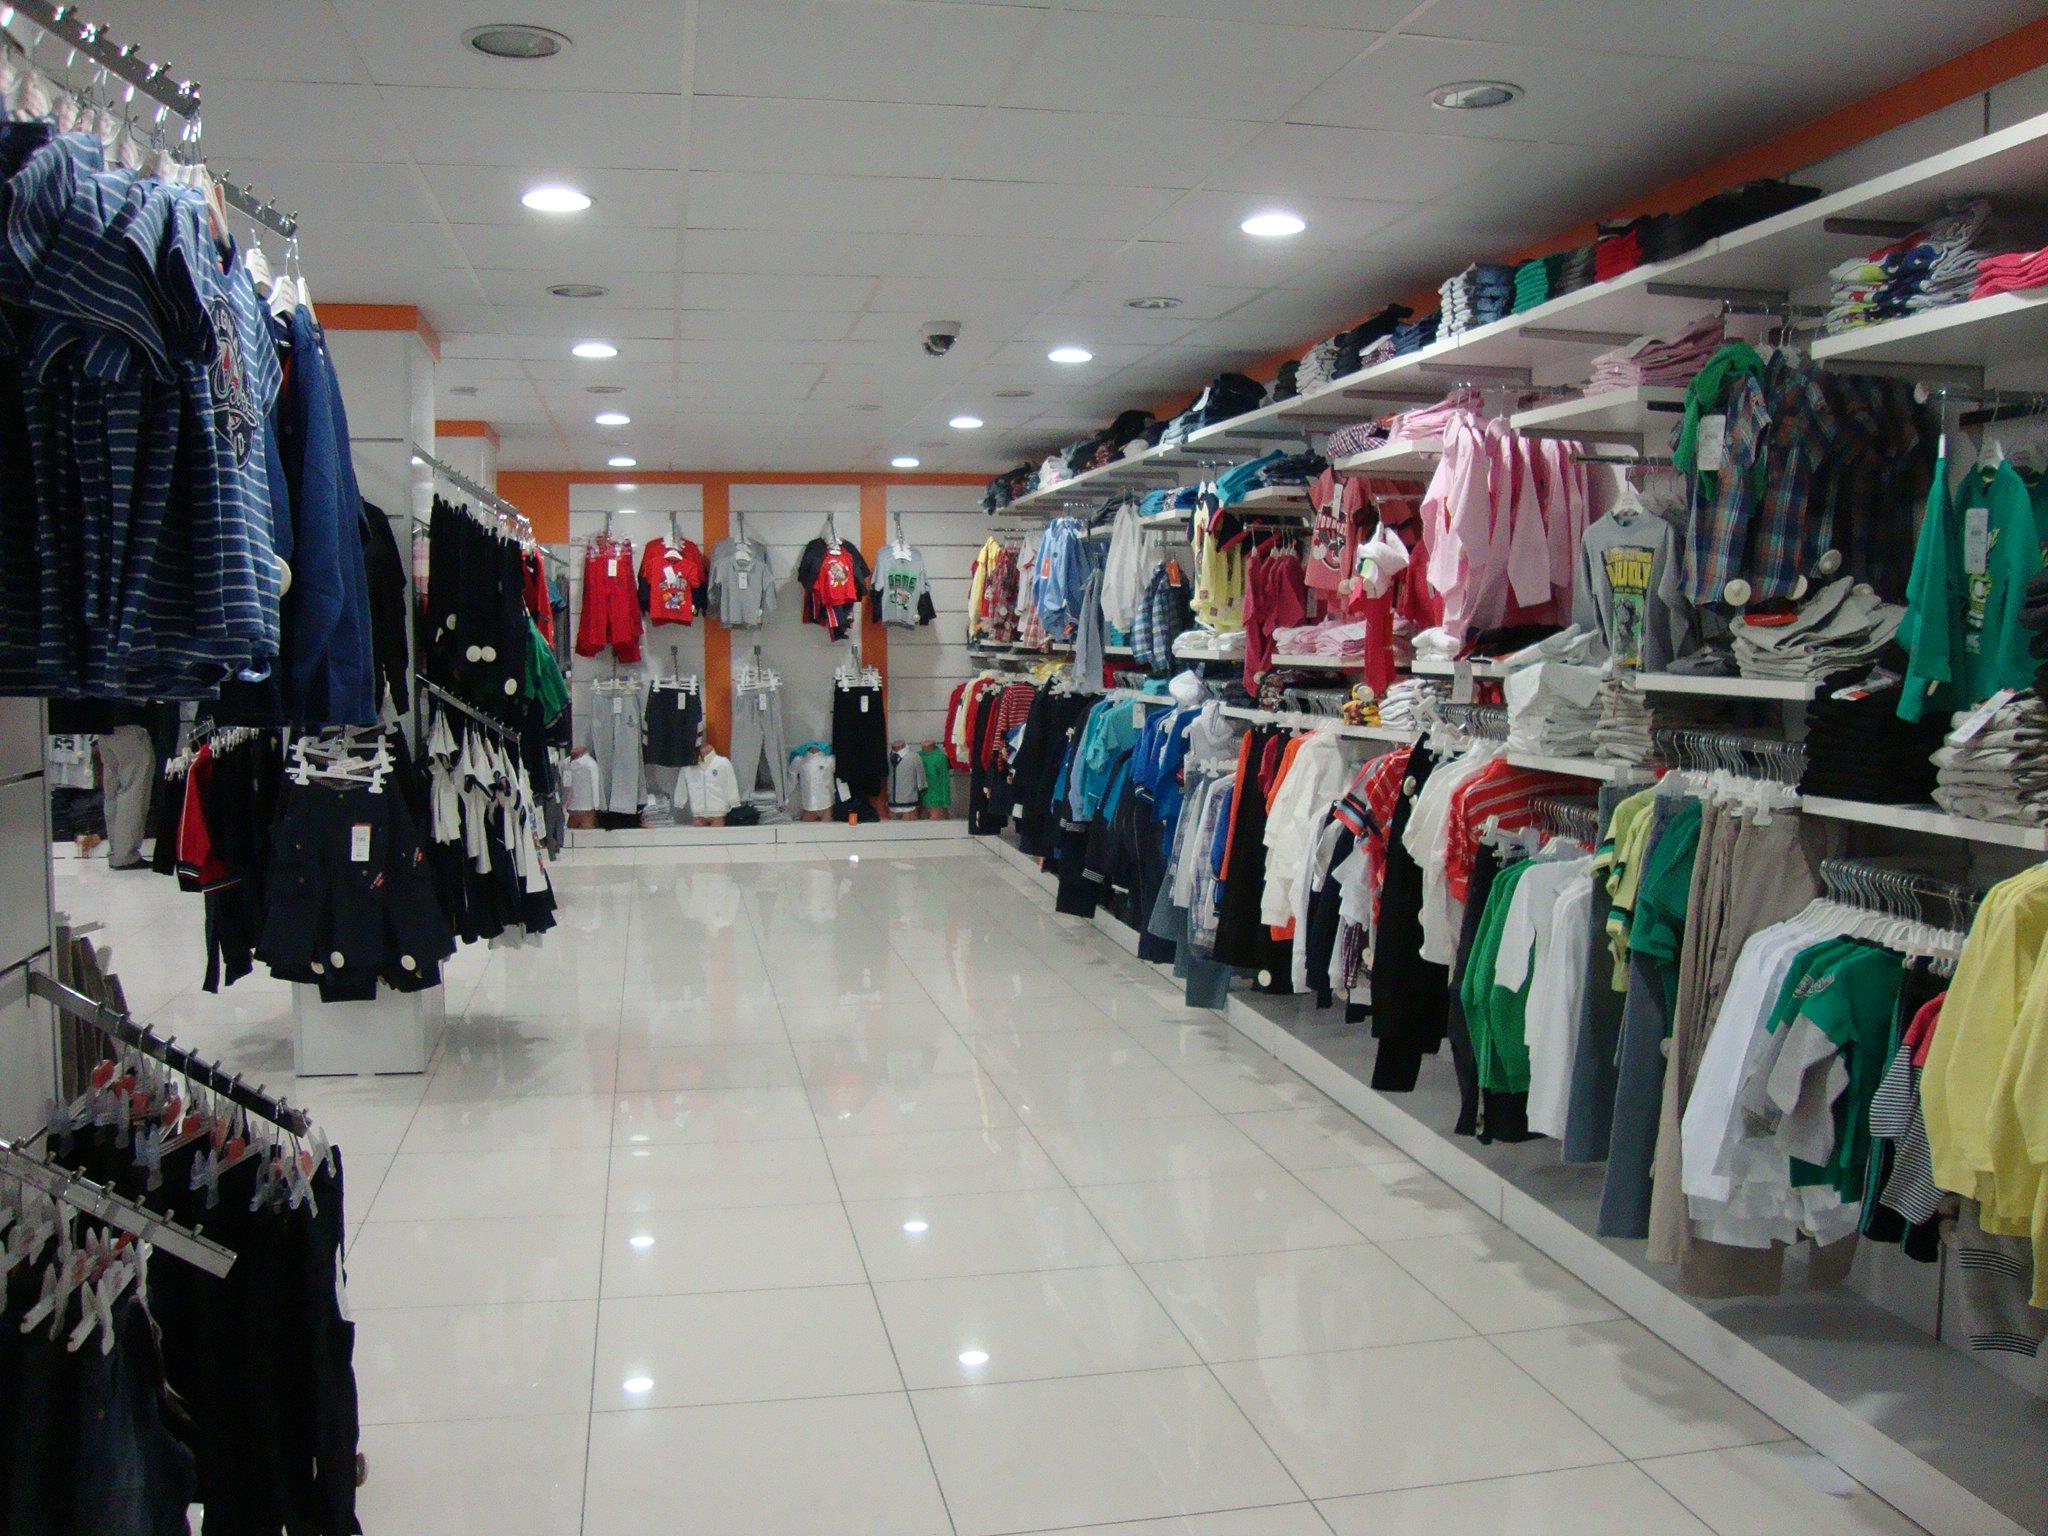 6239376e8 الملابس التركية الشتوية 2018 جولة كاملة بالفيديو للموديلات والأسعار